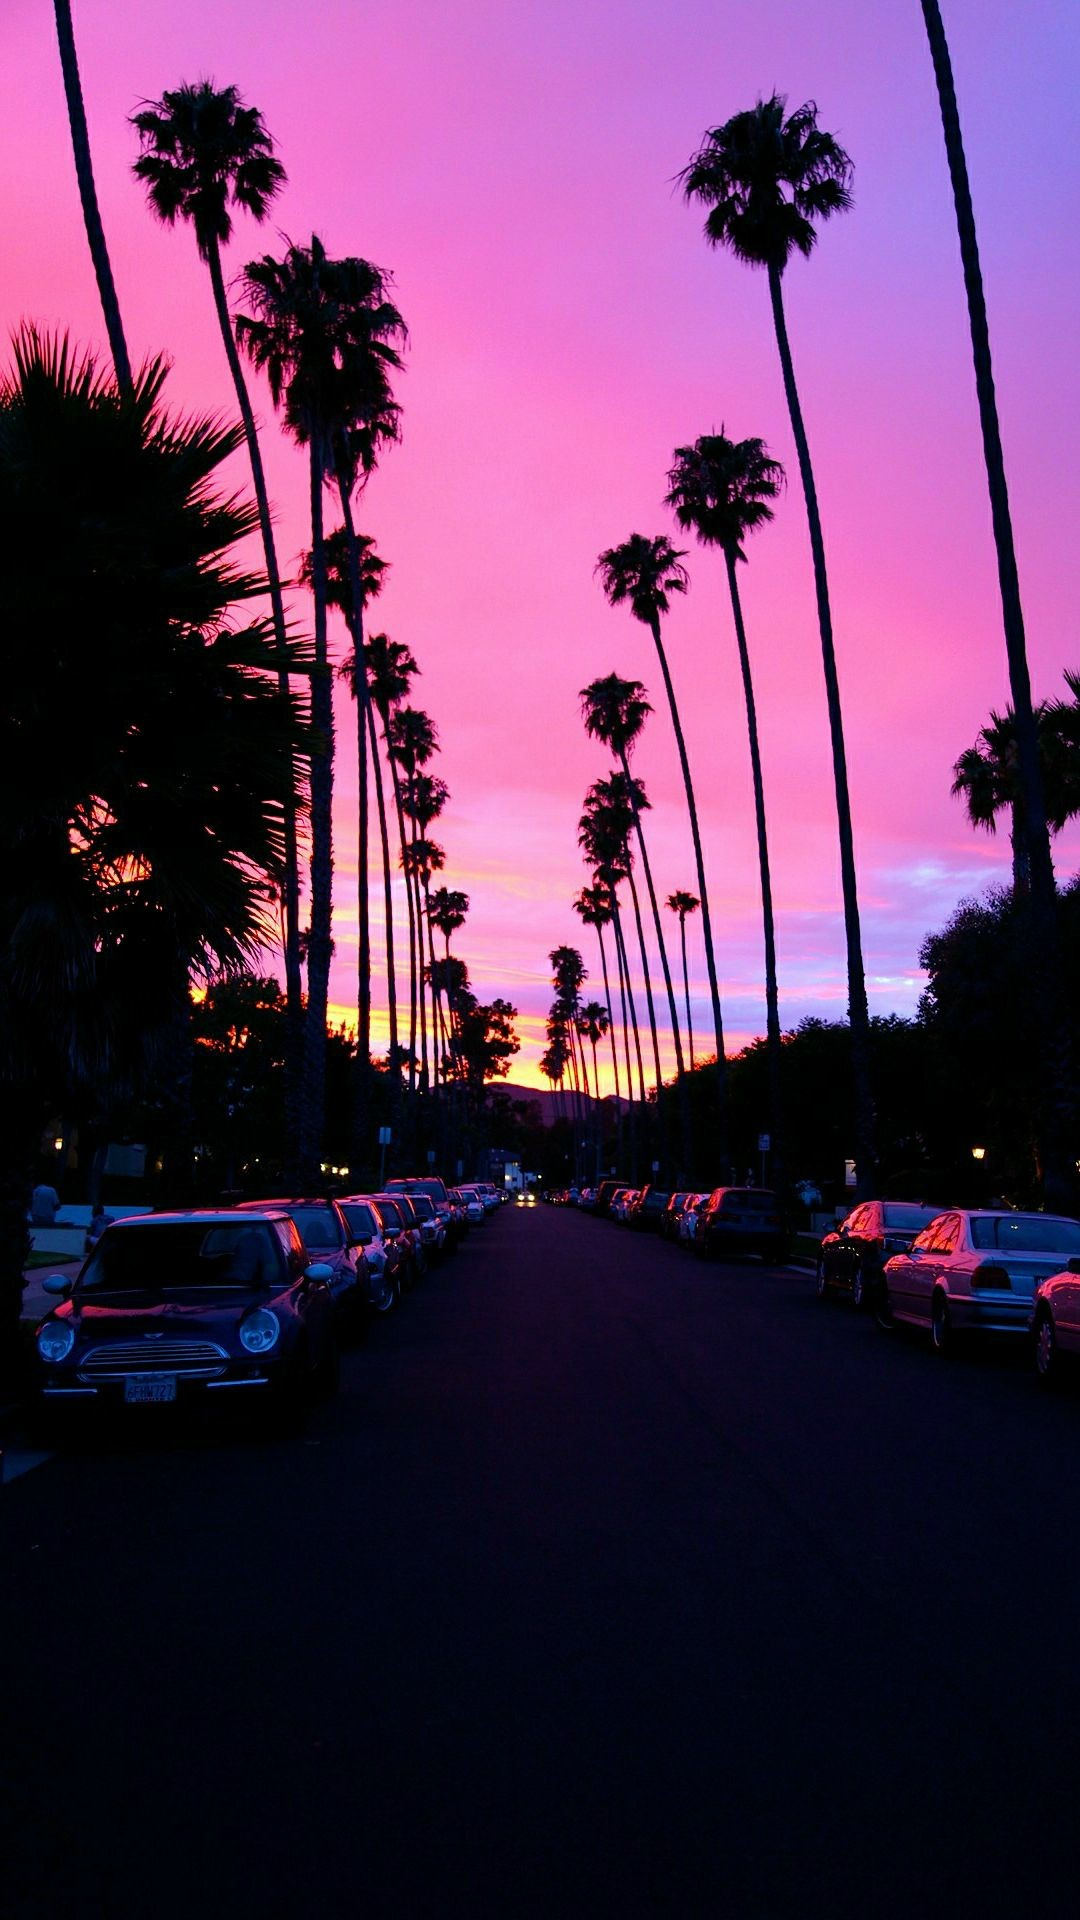 Los Angeles Wallpapers iPhone 6 Plus